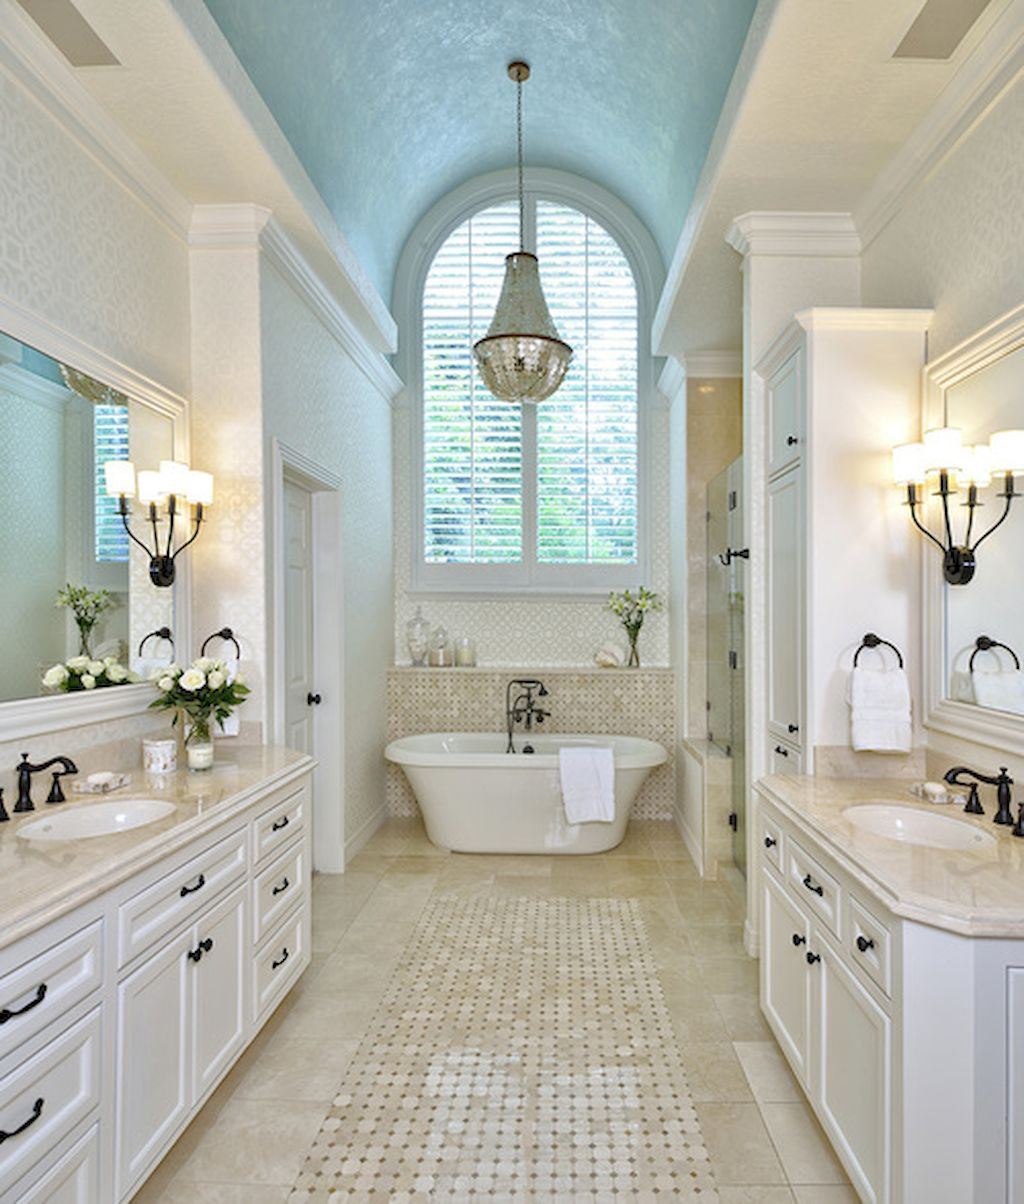 29 Gorgeous Small Bathroom Vanities Design Ideas  Small Bathroom Mesmerizing Bathroom Vanities Luxury Design Inspiration